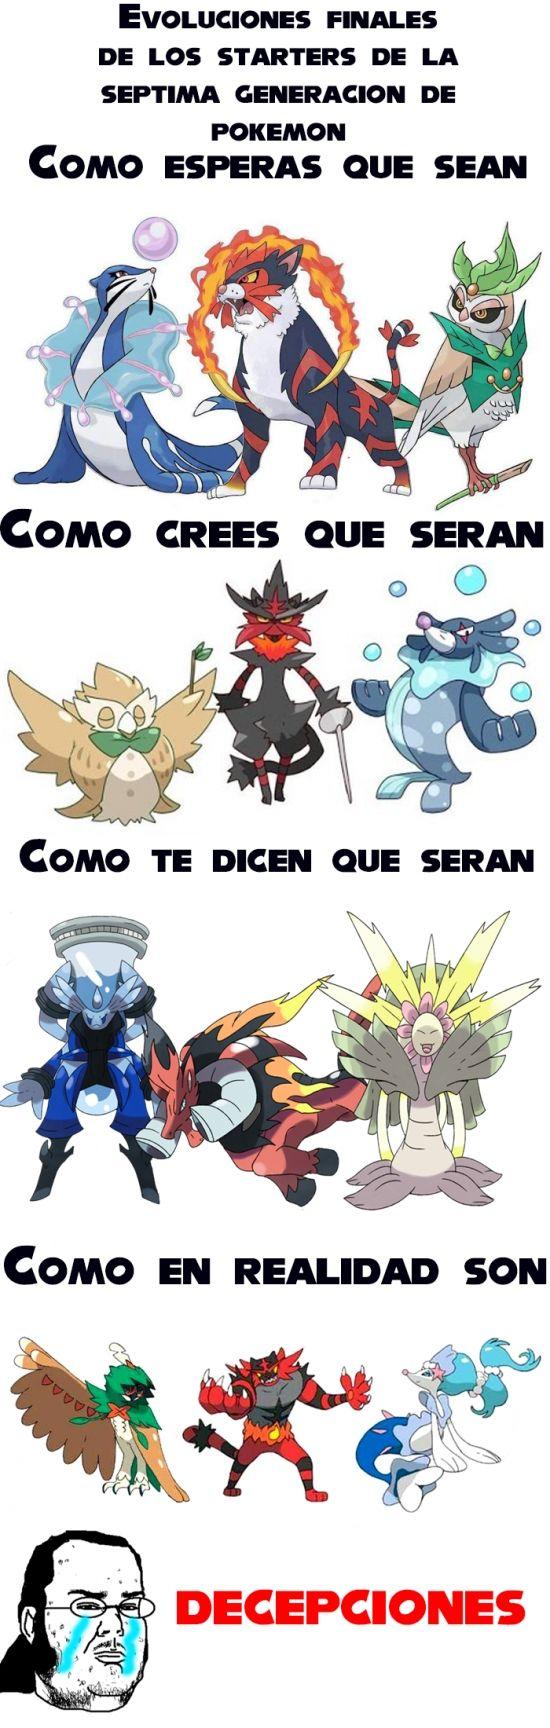 ★★★★★ Memes graciosos para compartir en facebook: Starters de la nueva generación de Pokémon... I➨ http://www.diverint.com/memes-graciosos-compartir-facebook-starters-nueva-generacion-pokemon/ →  #fotosdememeschistosos #memeschistosos2016 #memesenespañol #memesvideosderisa #videosdememeschistosos